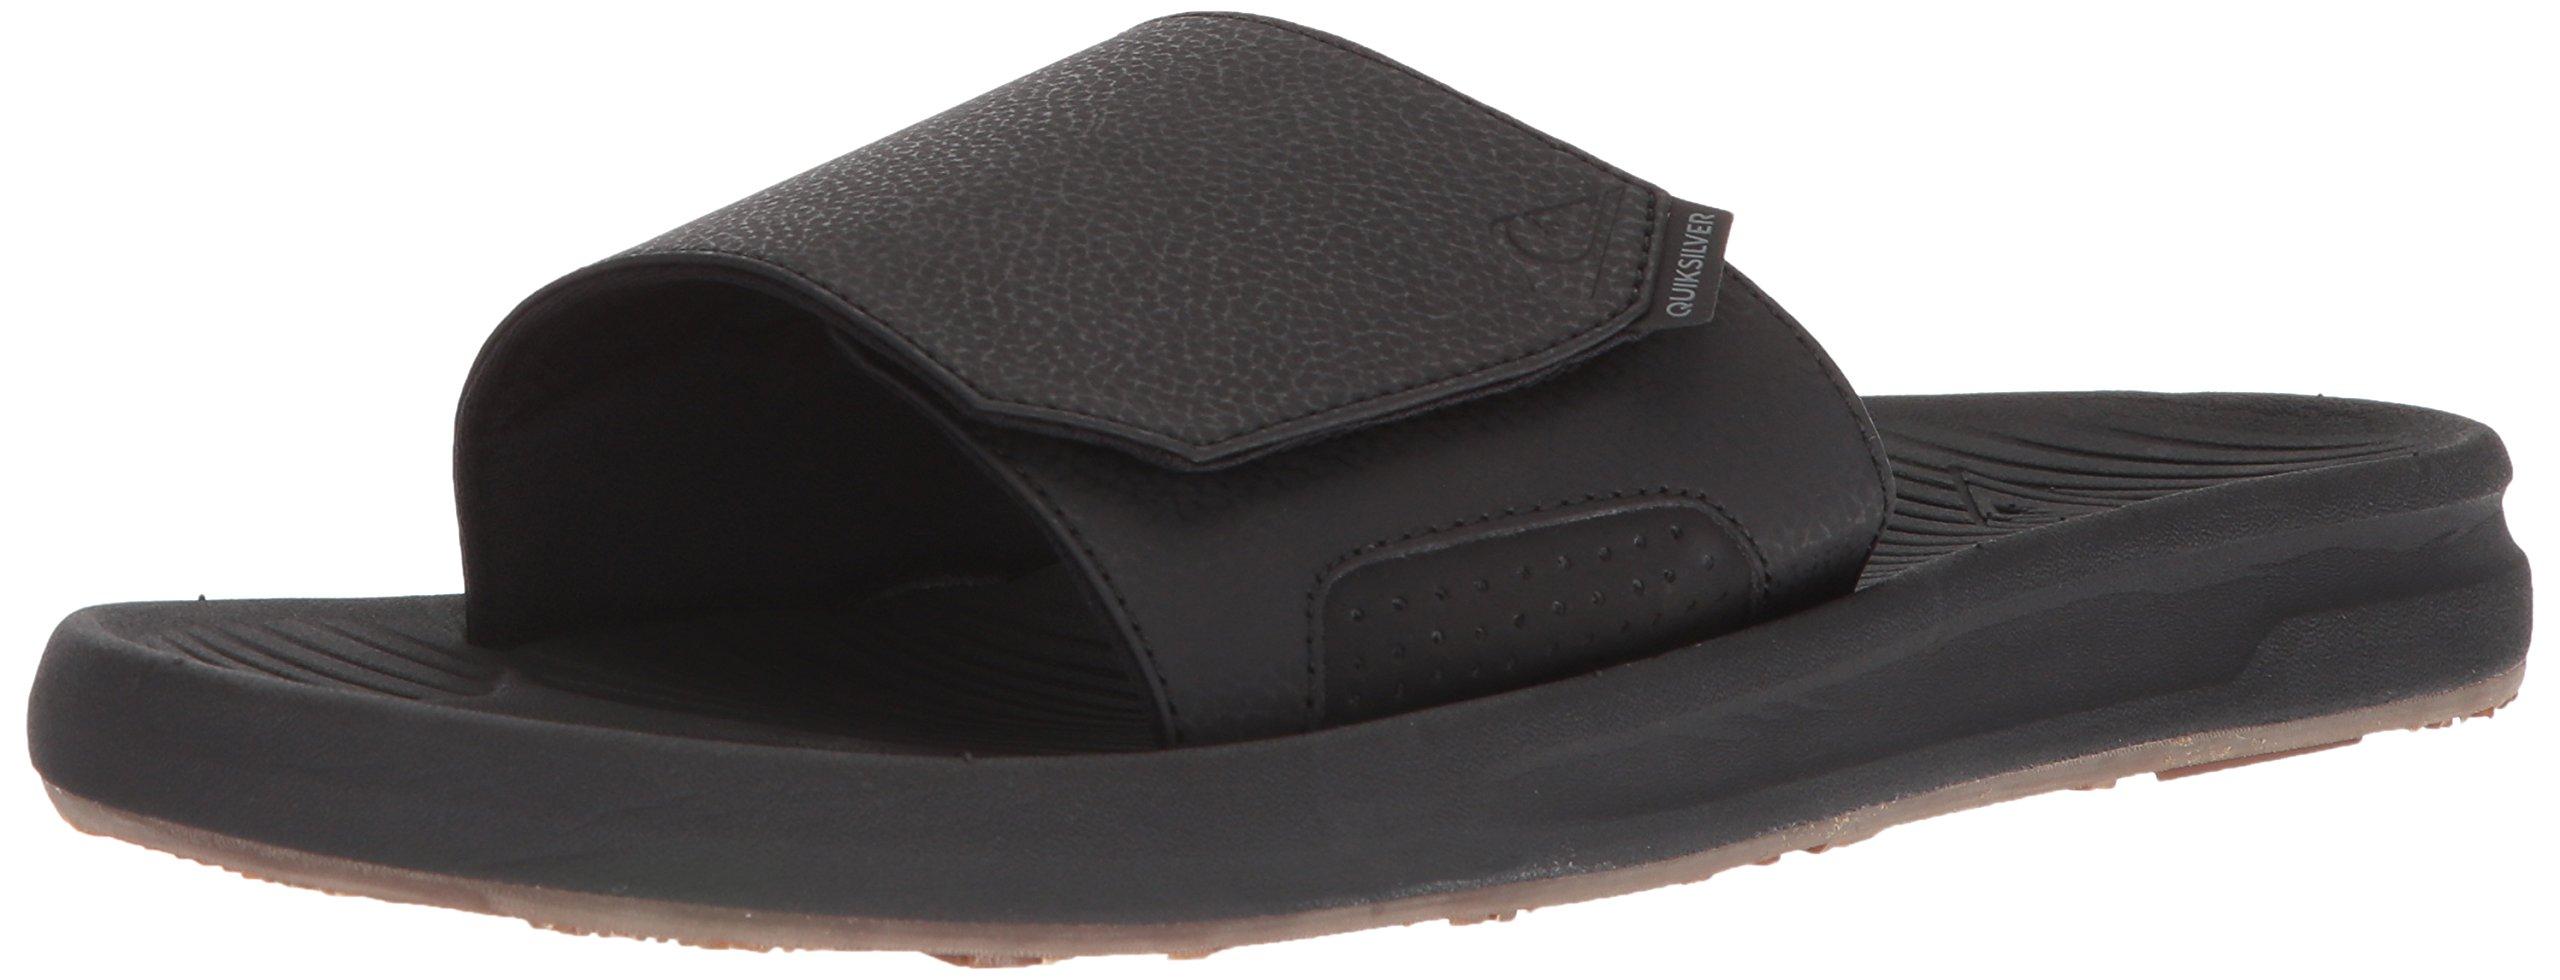 Quiksilver Men's Travel Oasis Slide Sandal, Black/Black/Brown, 8(41) M US